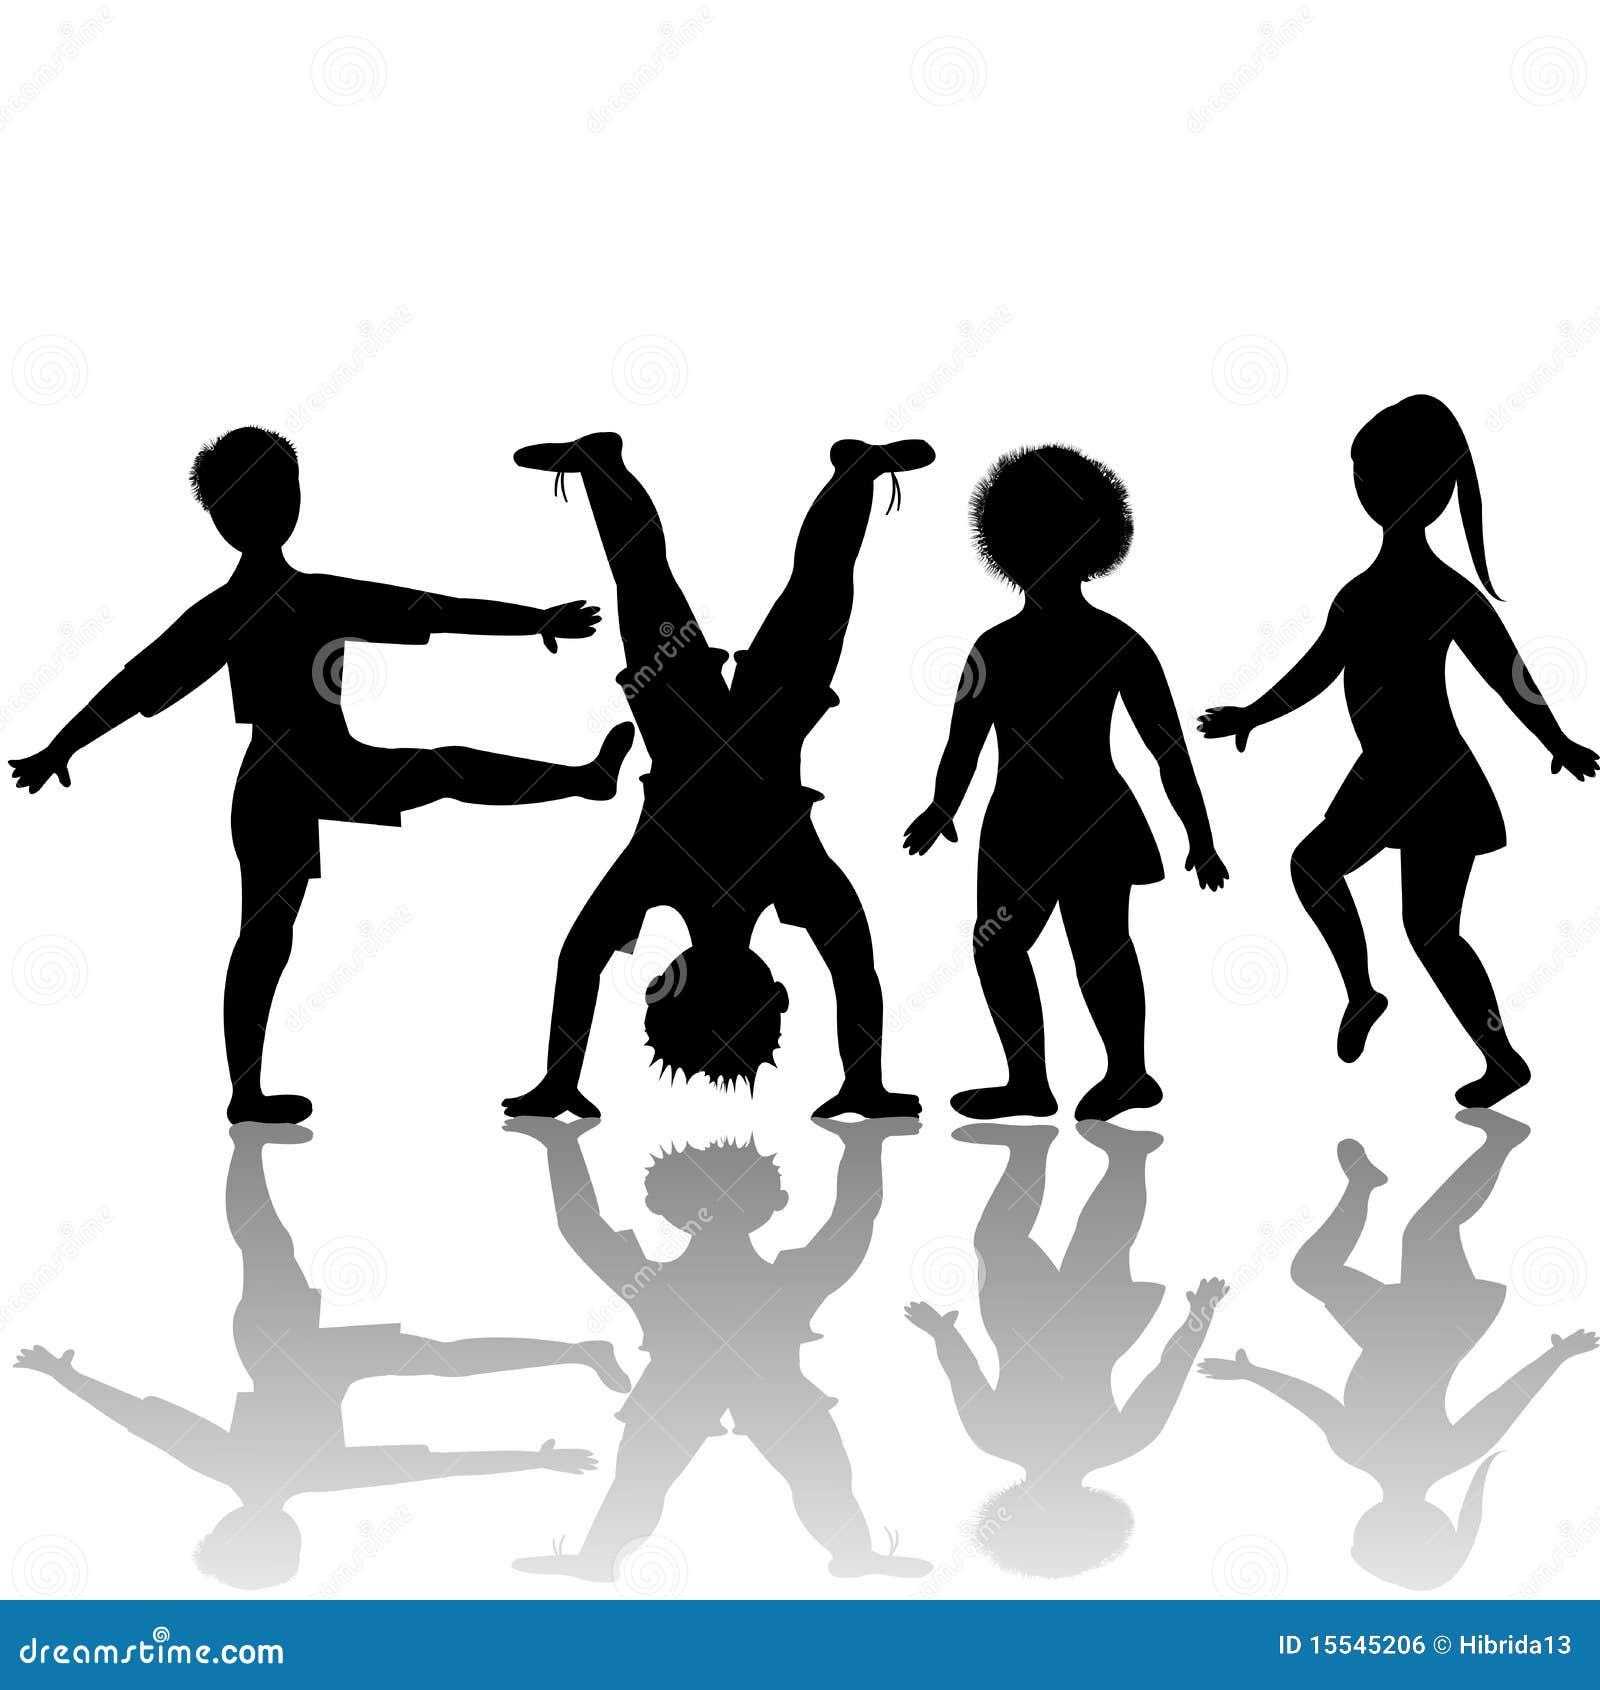 planes kids with Imagen De Archivo Libre De Regal C3 Adas El Jugar De Las Siluetas De Los Ni C3 B1os Image15545206 on Rich The Kid 2016 Interview together with Toy Fair 2016 Auldey Toys additionally fort Blue Skies Fabric Conditioner 1 5l 282378 as well Stock Illustration Happy Birthday 10 Years Kids as well Stock Illustration Dissolving Solids Solubility Chemistry.